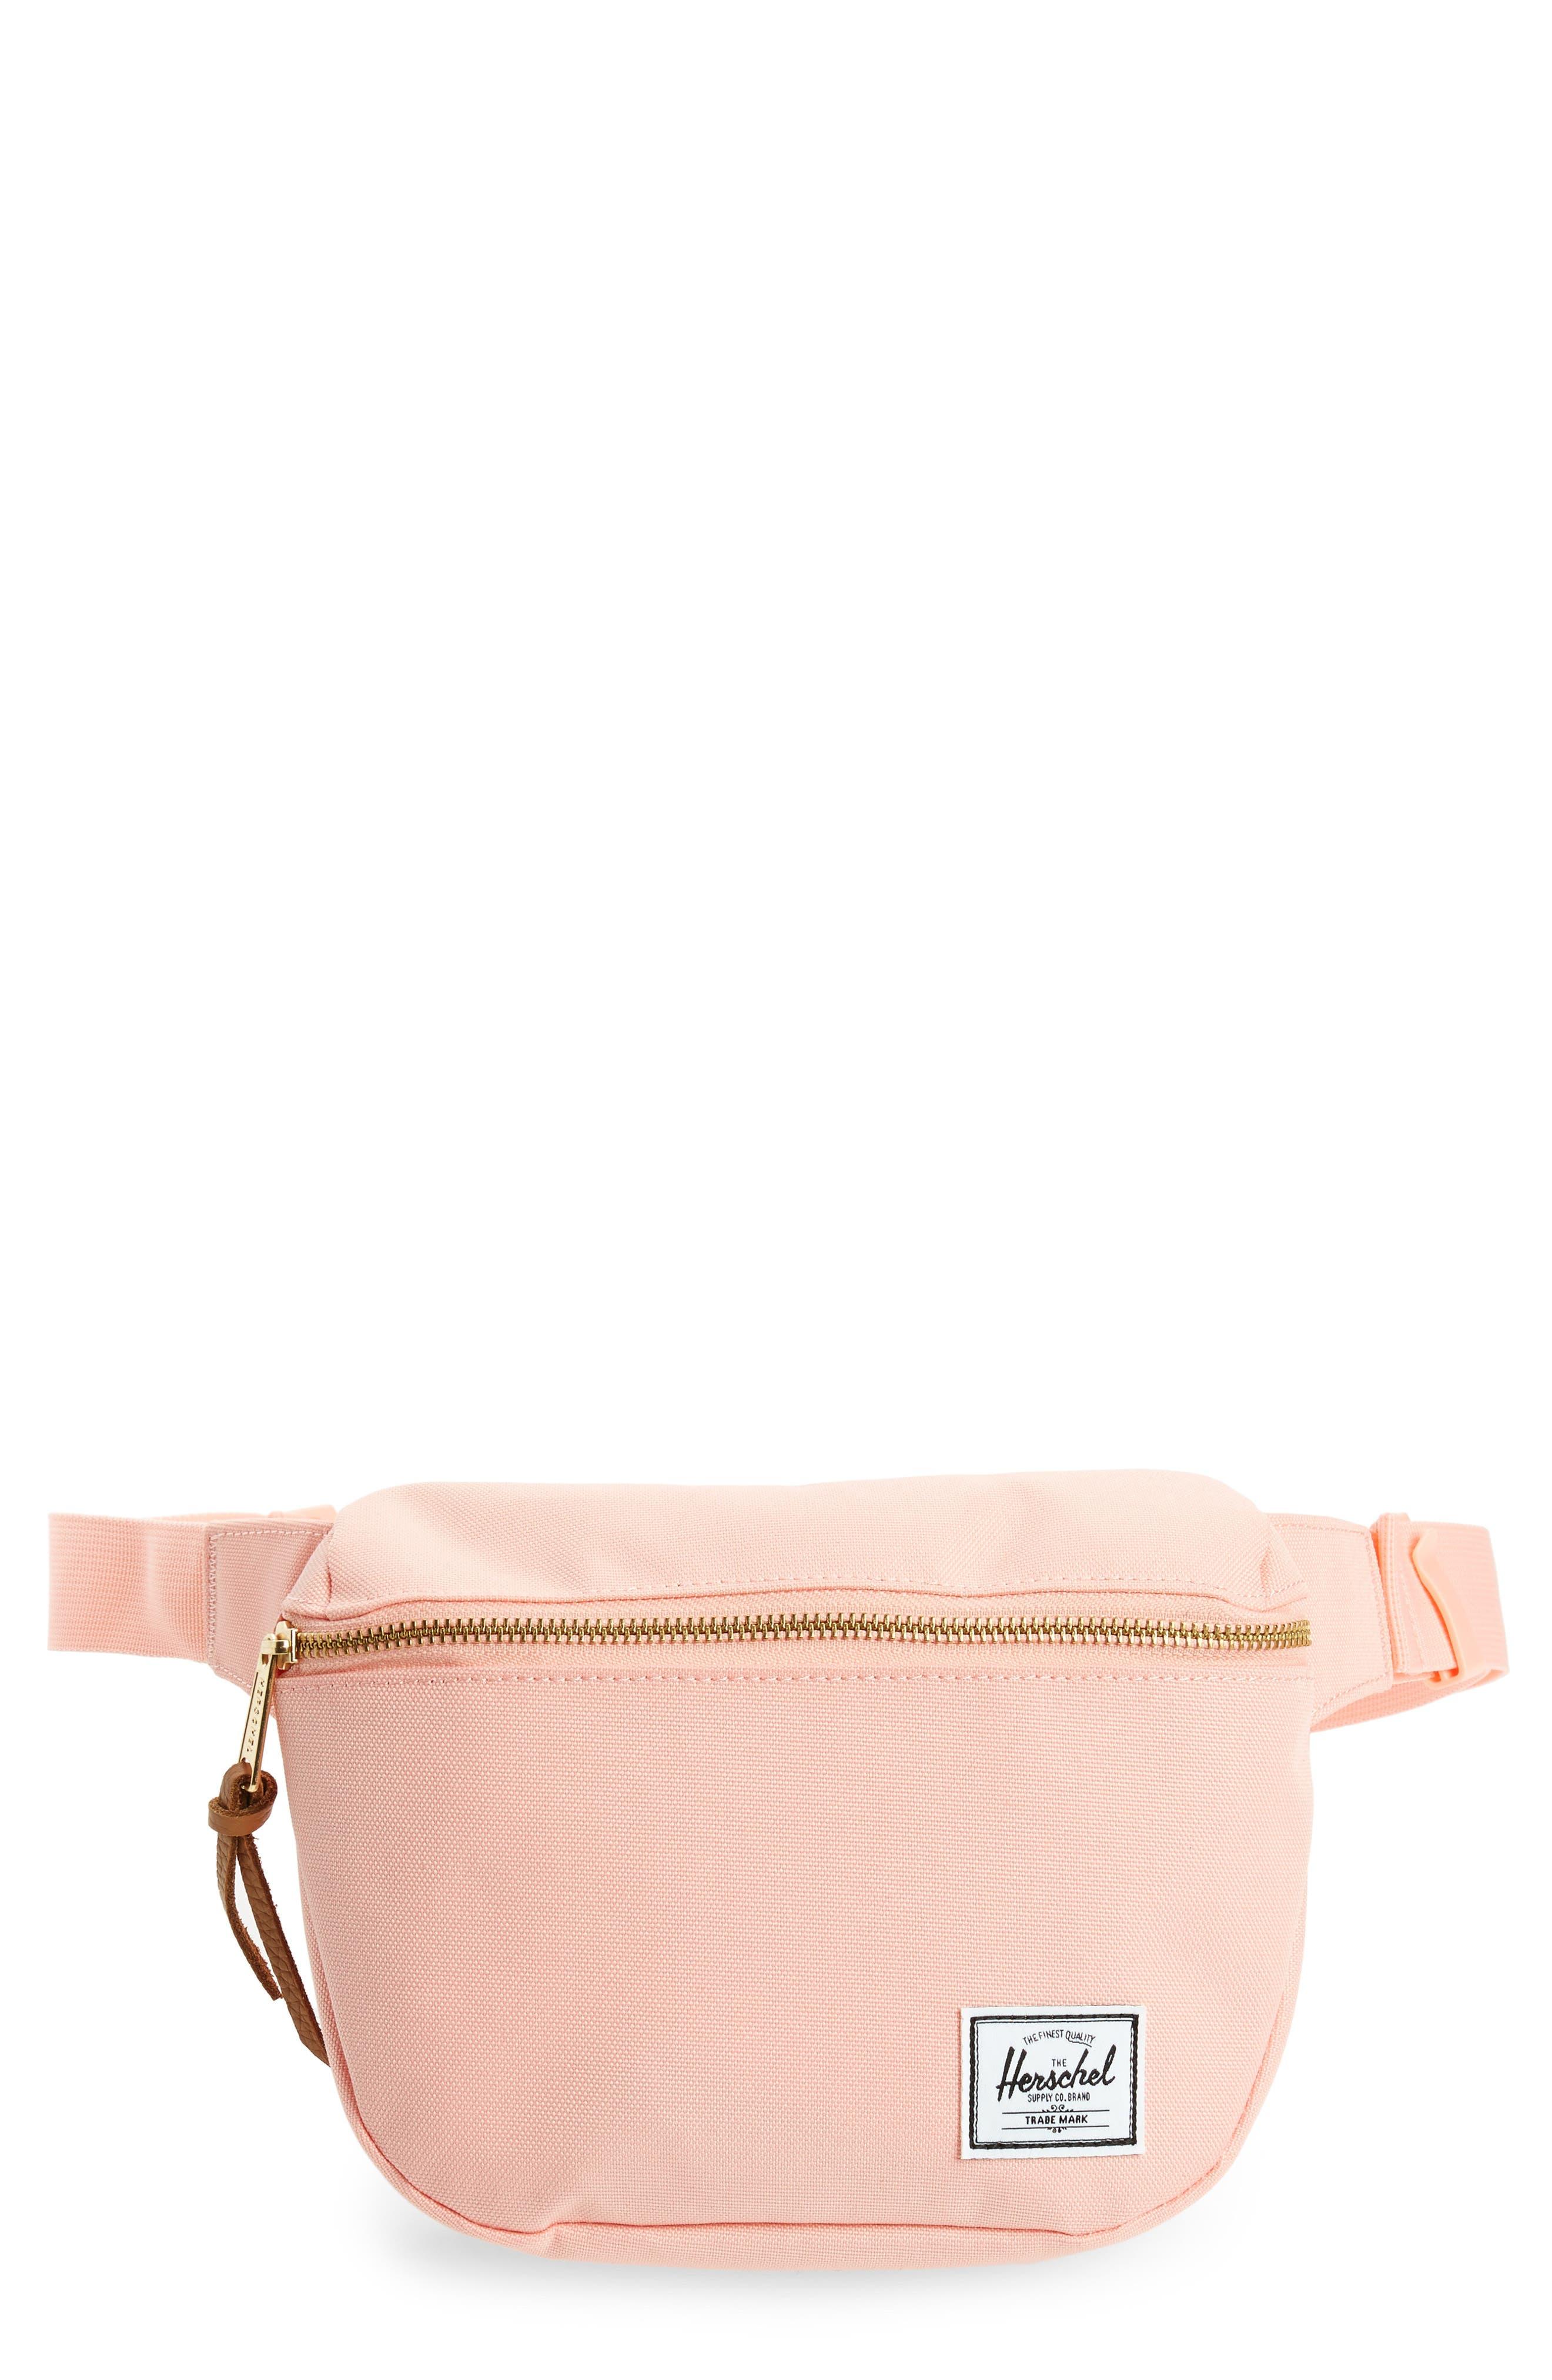 Main Image - Herschel Supply Co. Fifteen Belt Bag